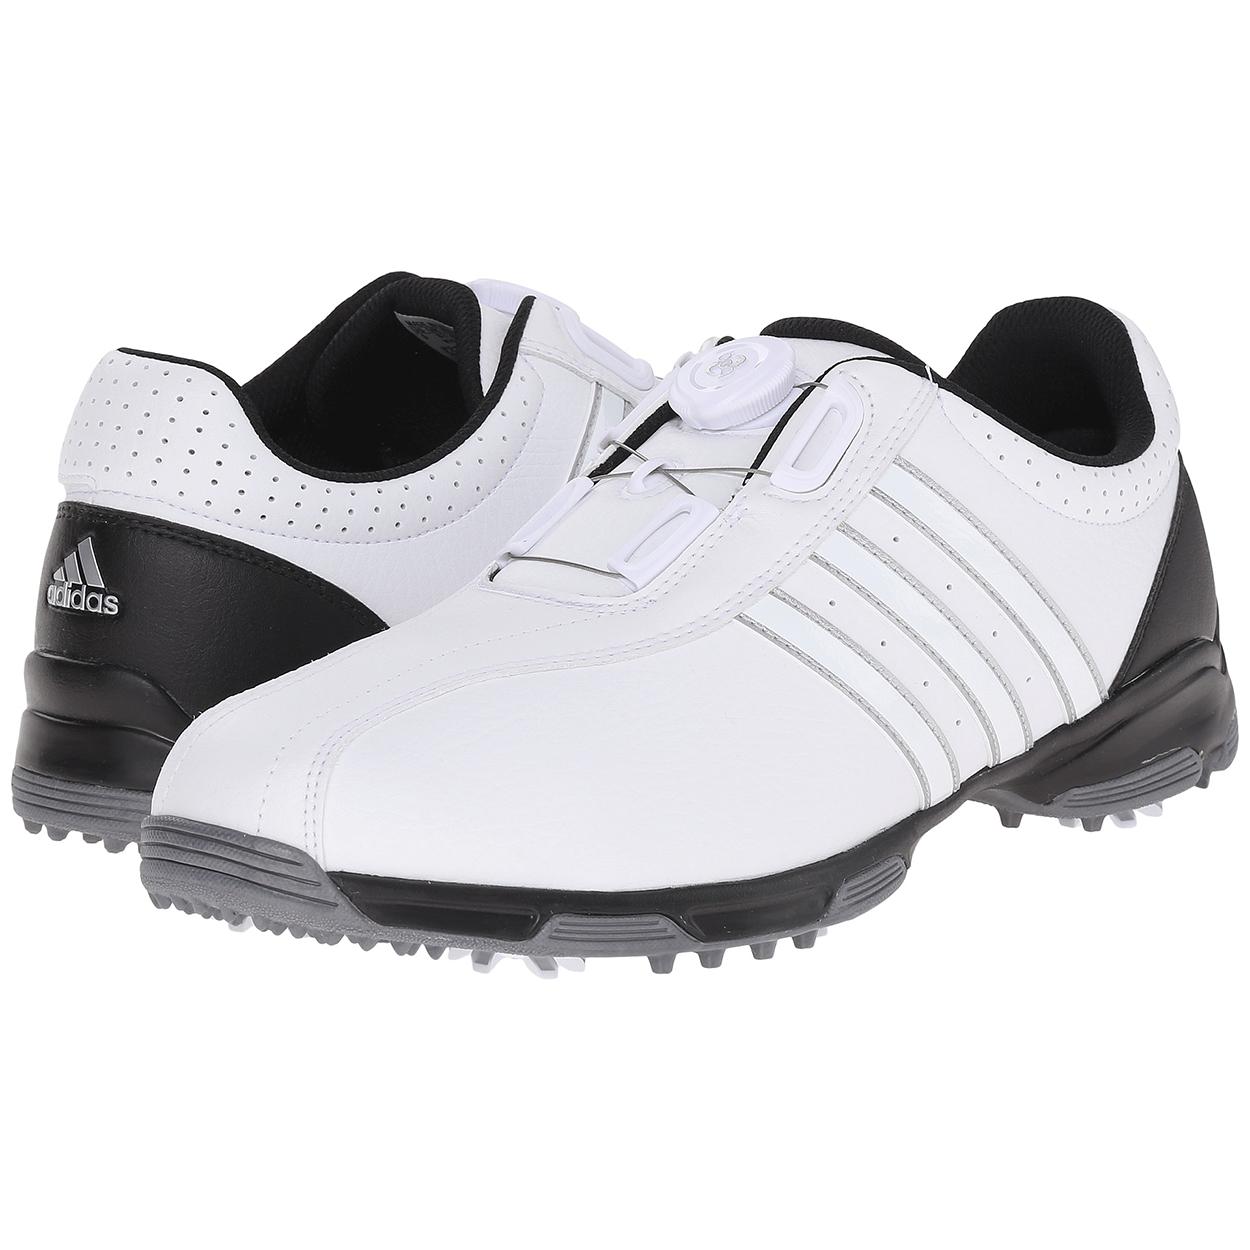 Adidas  Traxion Men S Golf Shoes